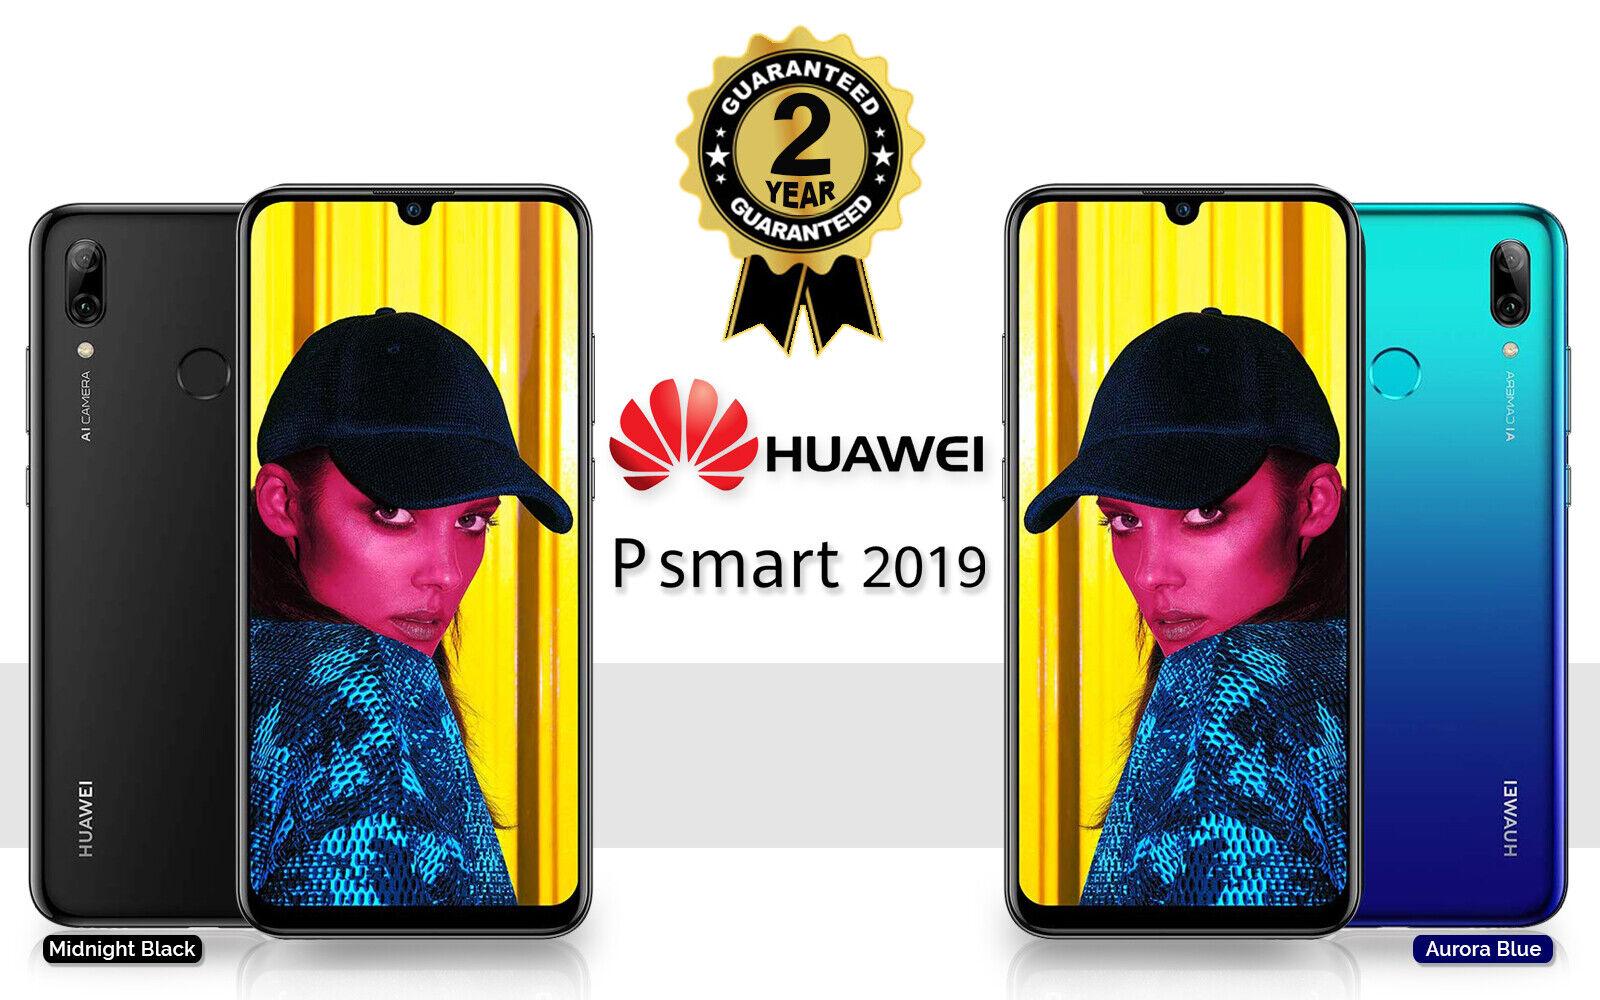 Android Phone - NEW HUAWEI P SMART 2019 DUAL SIM 64GB 4G LTE UNLOCKED PHONE SEALED BLACK BLUE